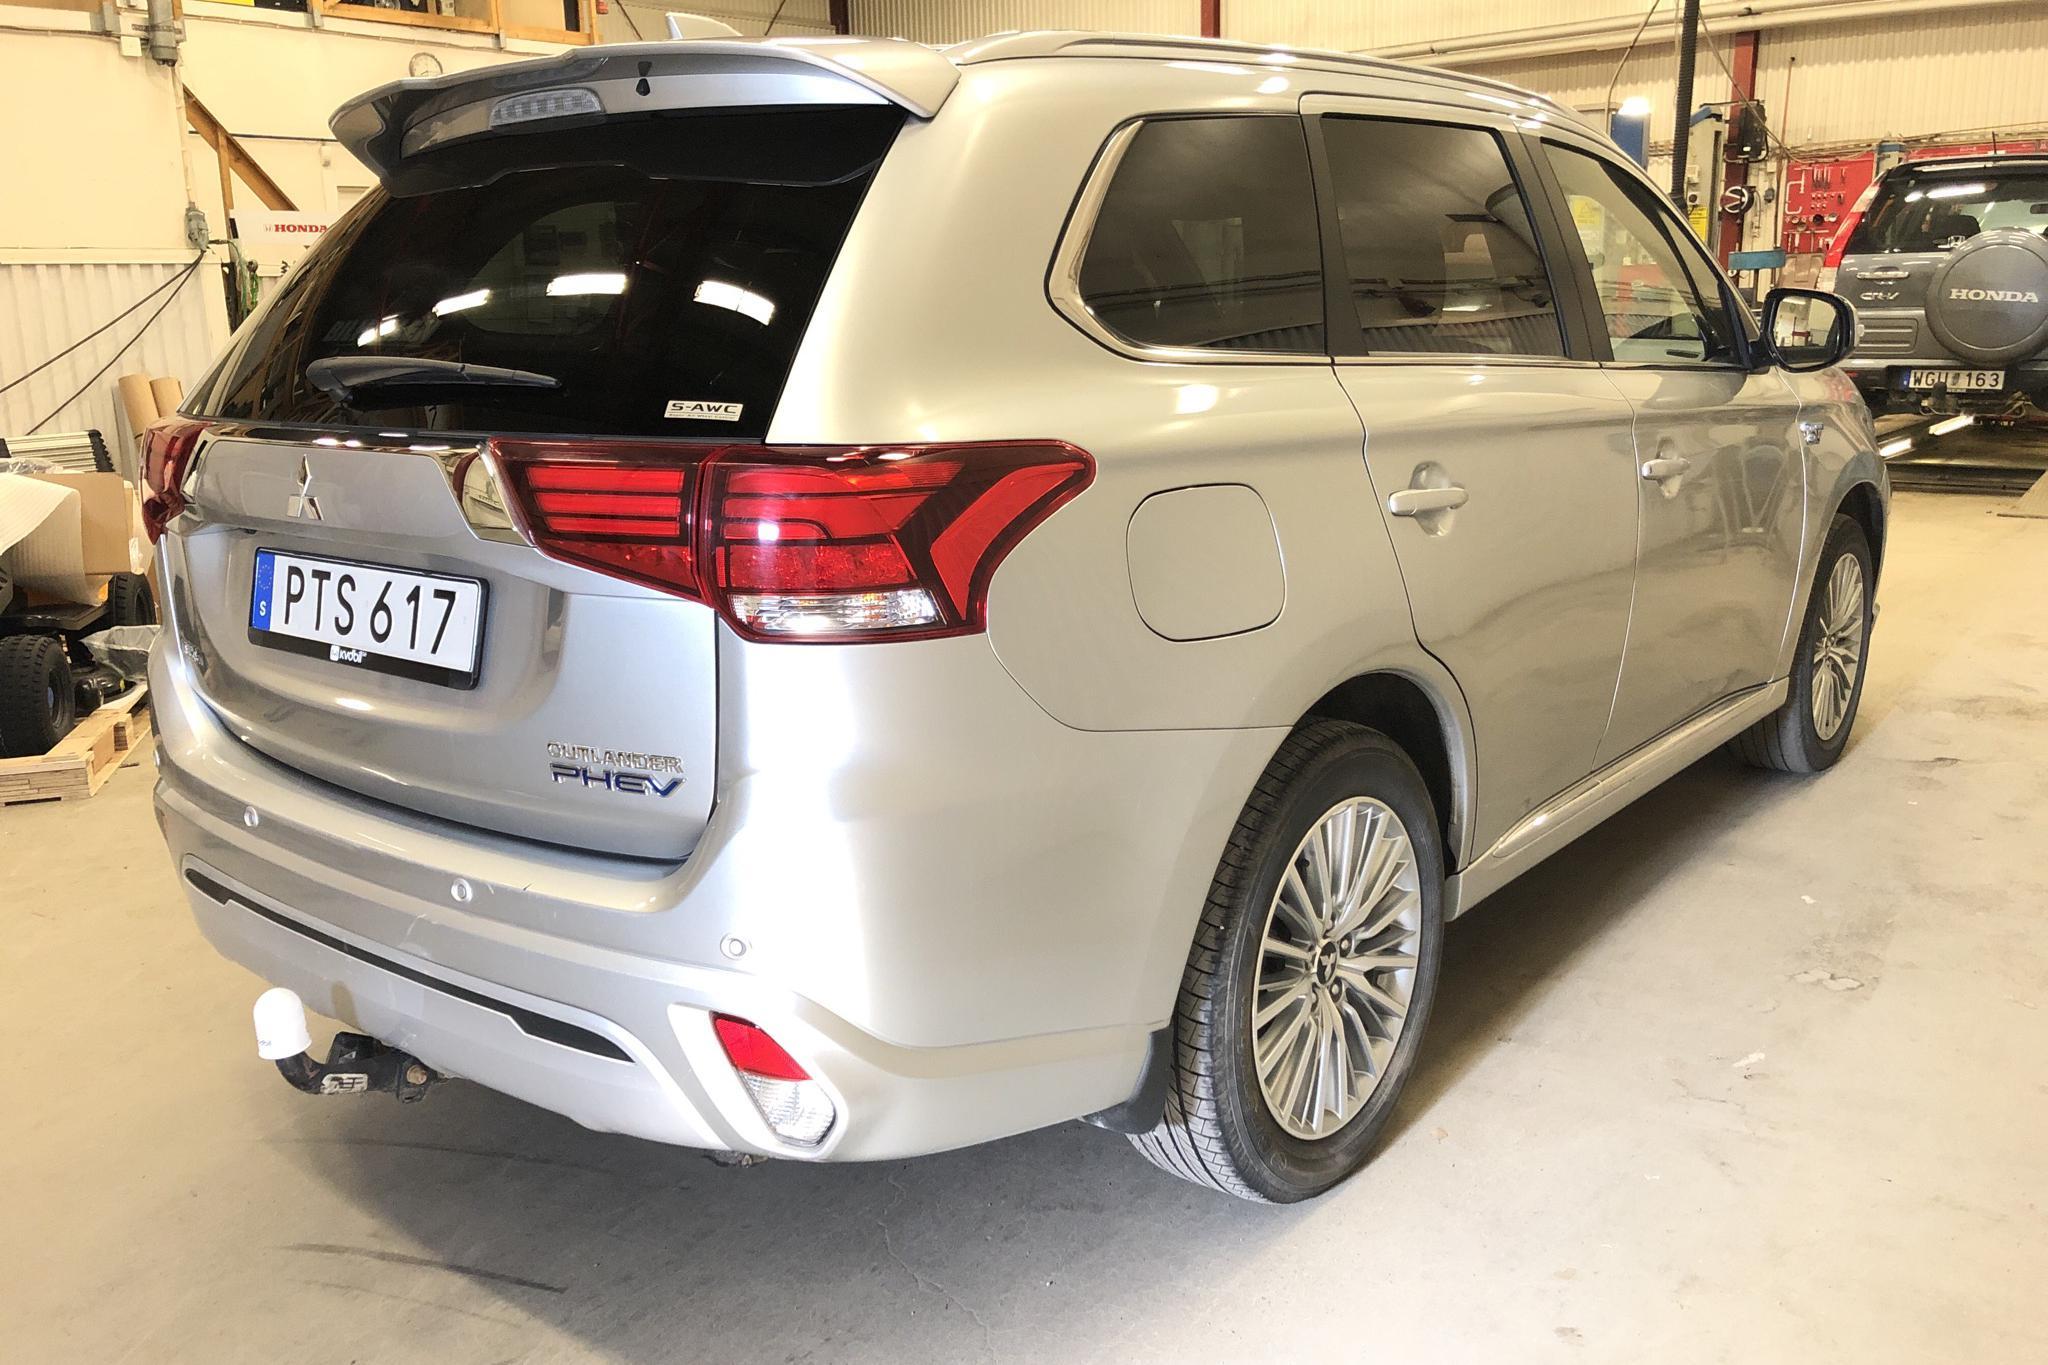 Mitsubishi Outlander 2.4 Plug-in Hybrid 4WD (136hk) - 7 996 mil - Automat - silver - 2019